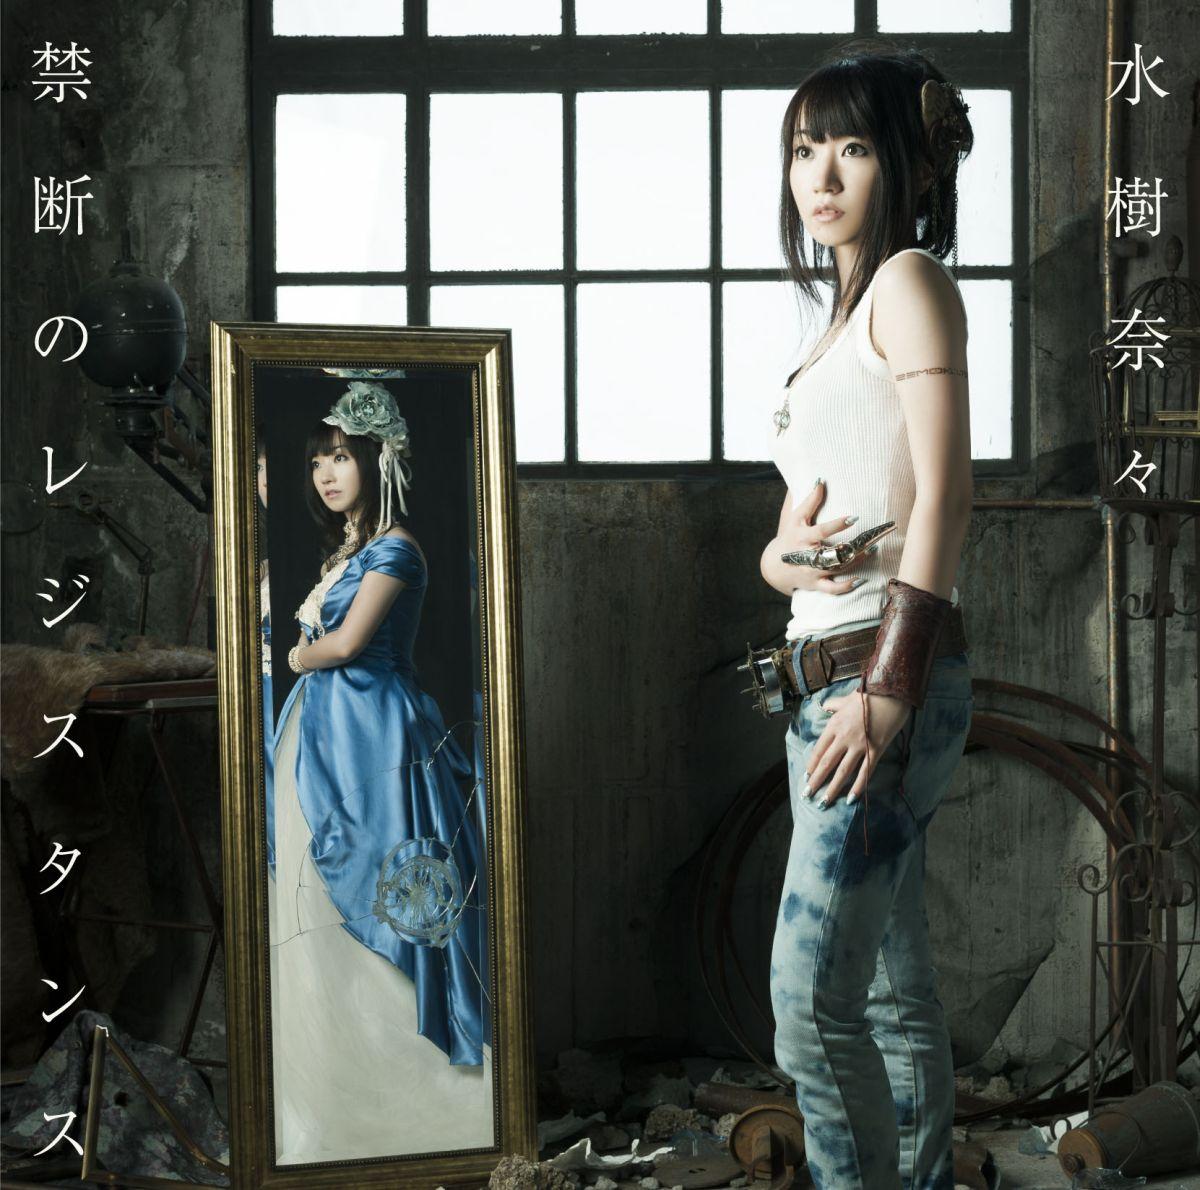 20170205.01.09 Nana Mizuki - Kindan no Resistance cover.jpg